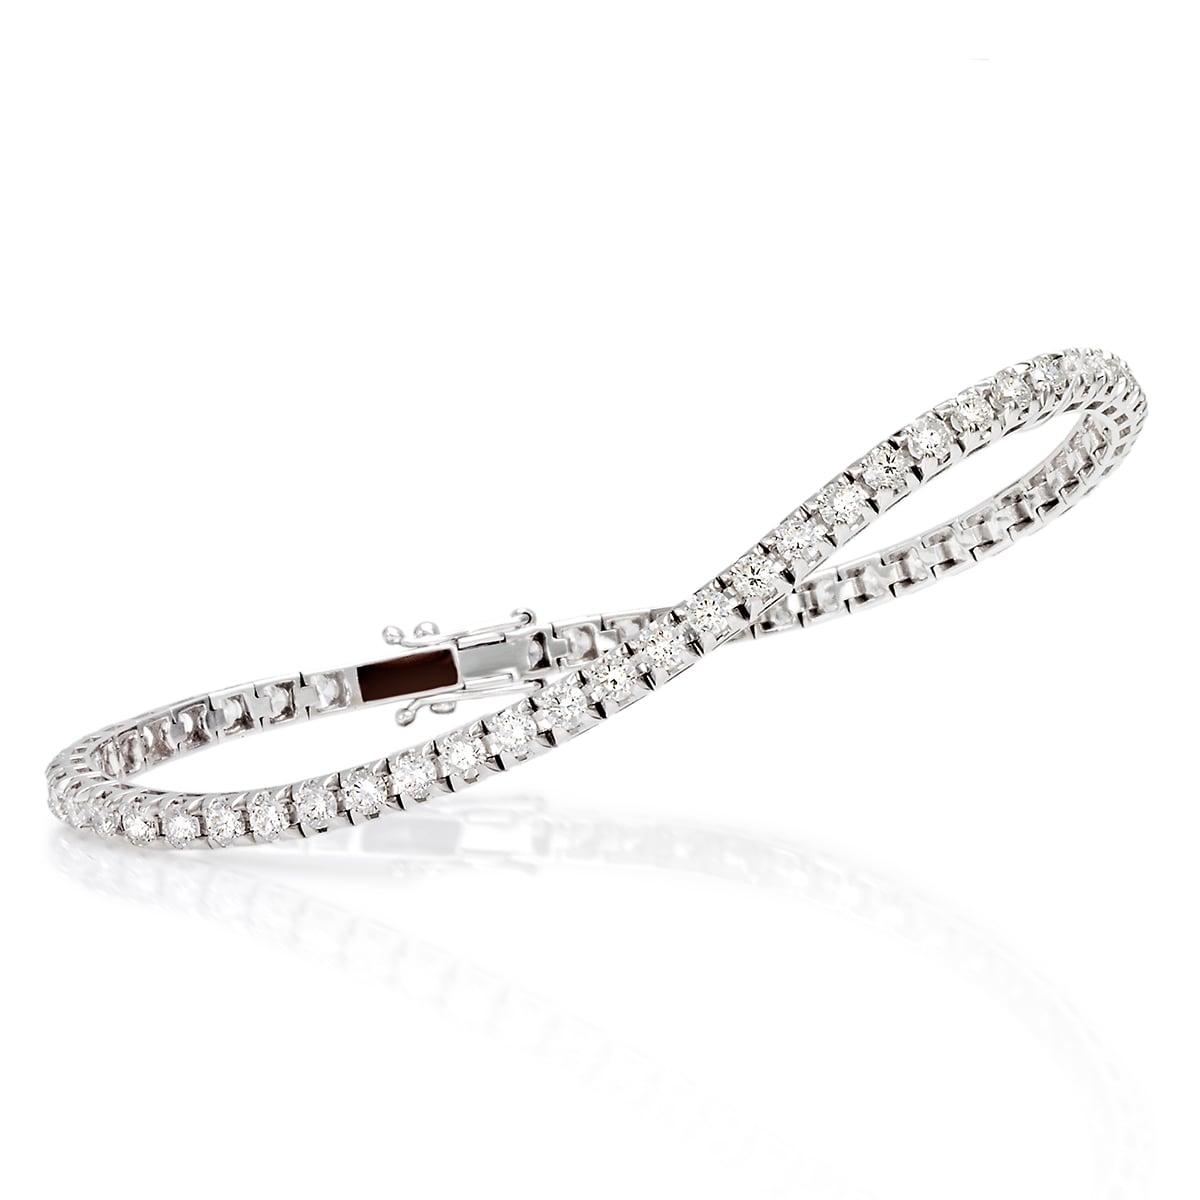 Tennisarmband med diamanter 3,30ct.